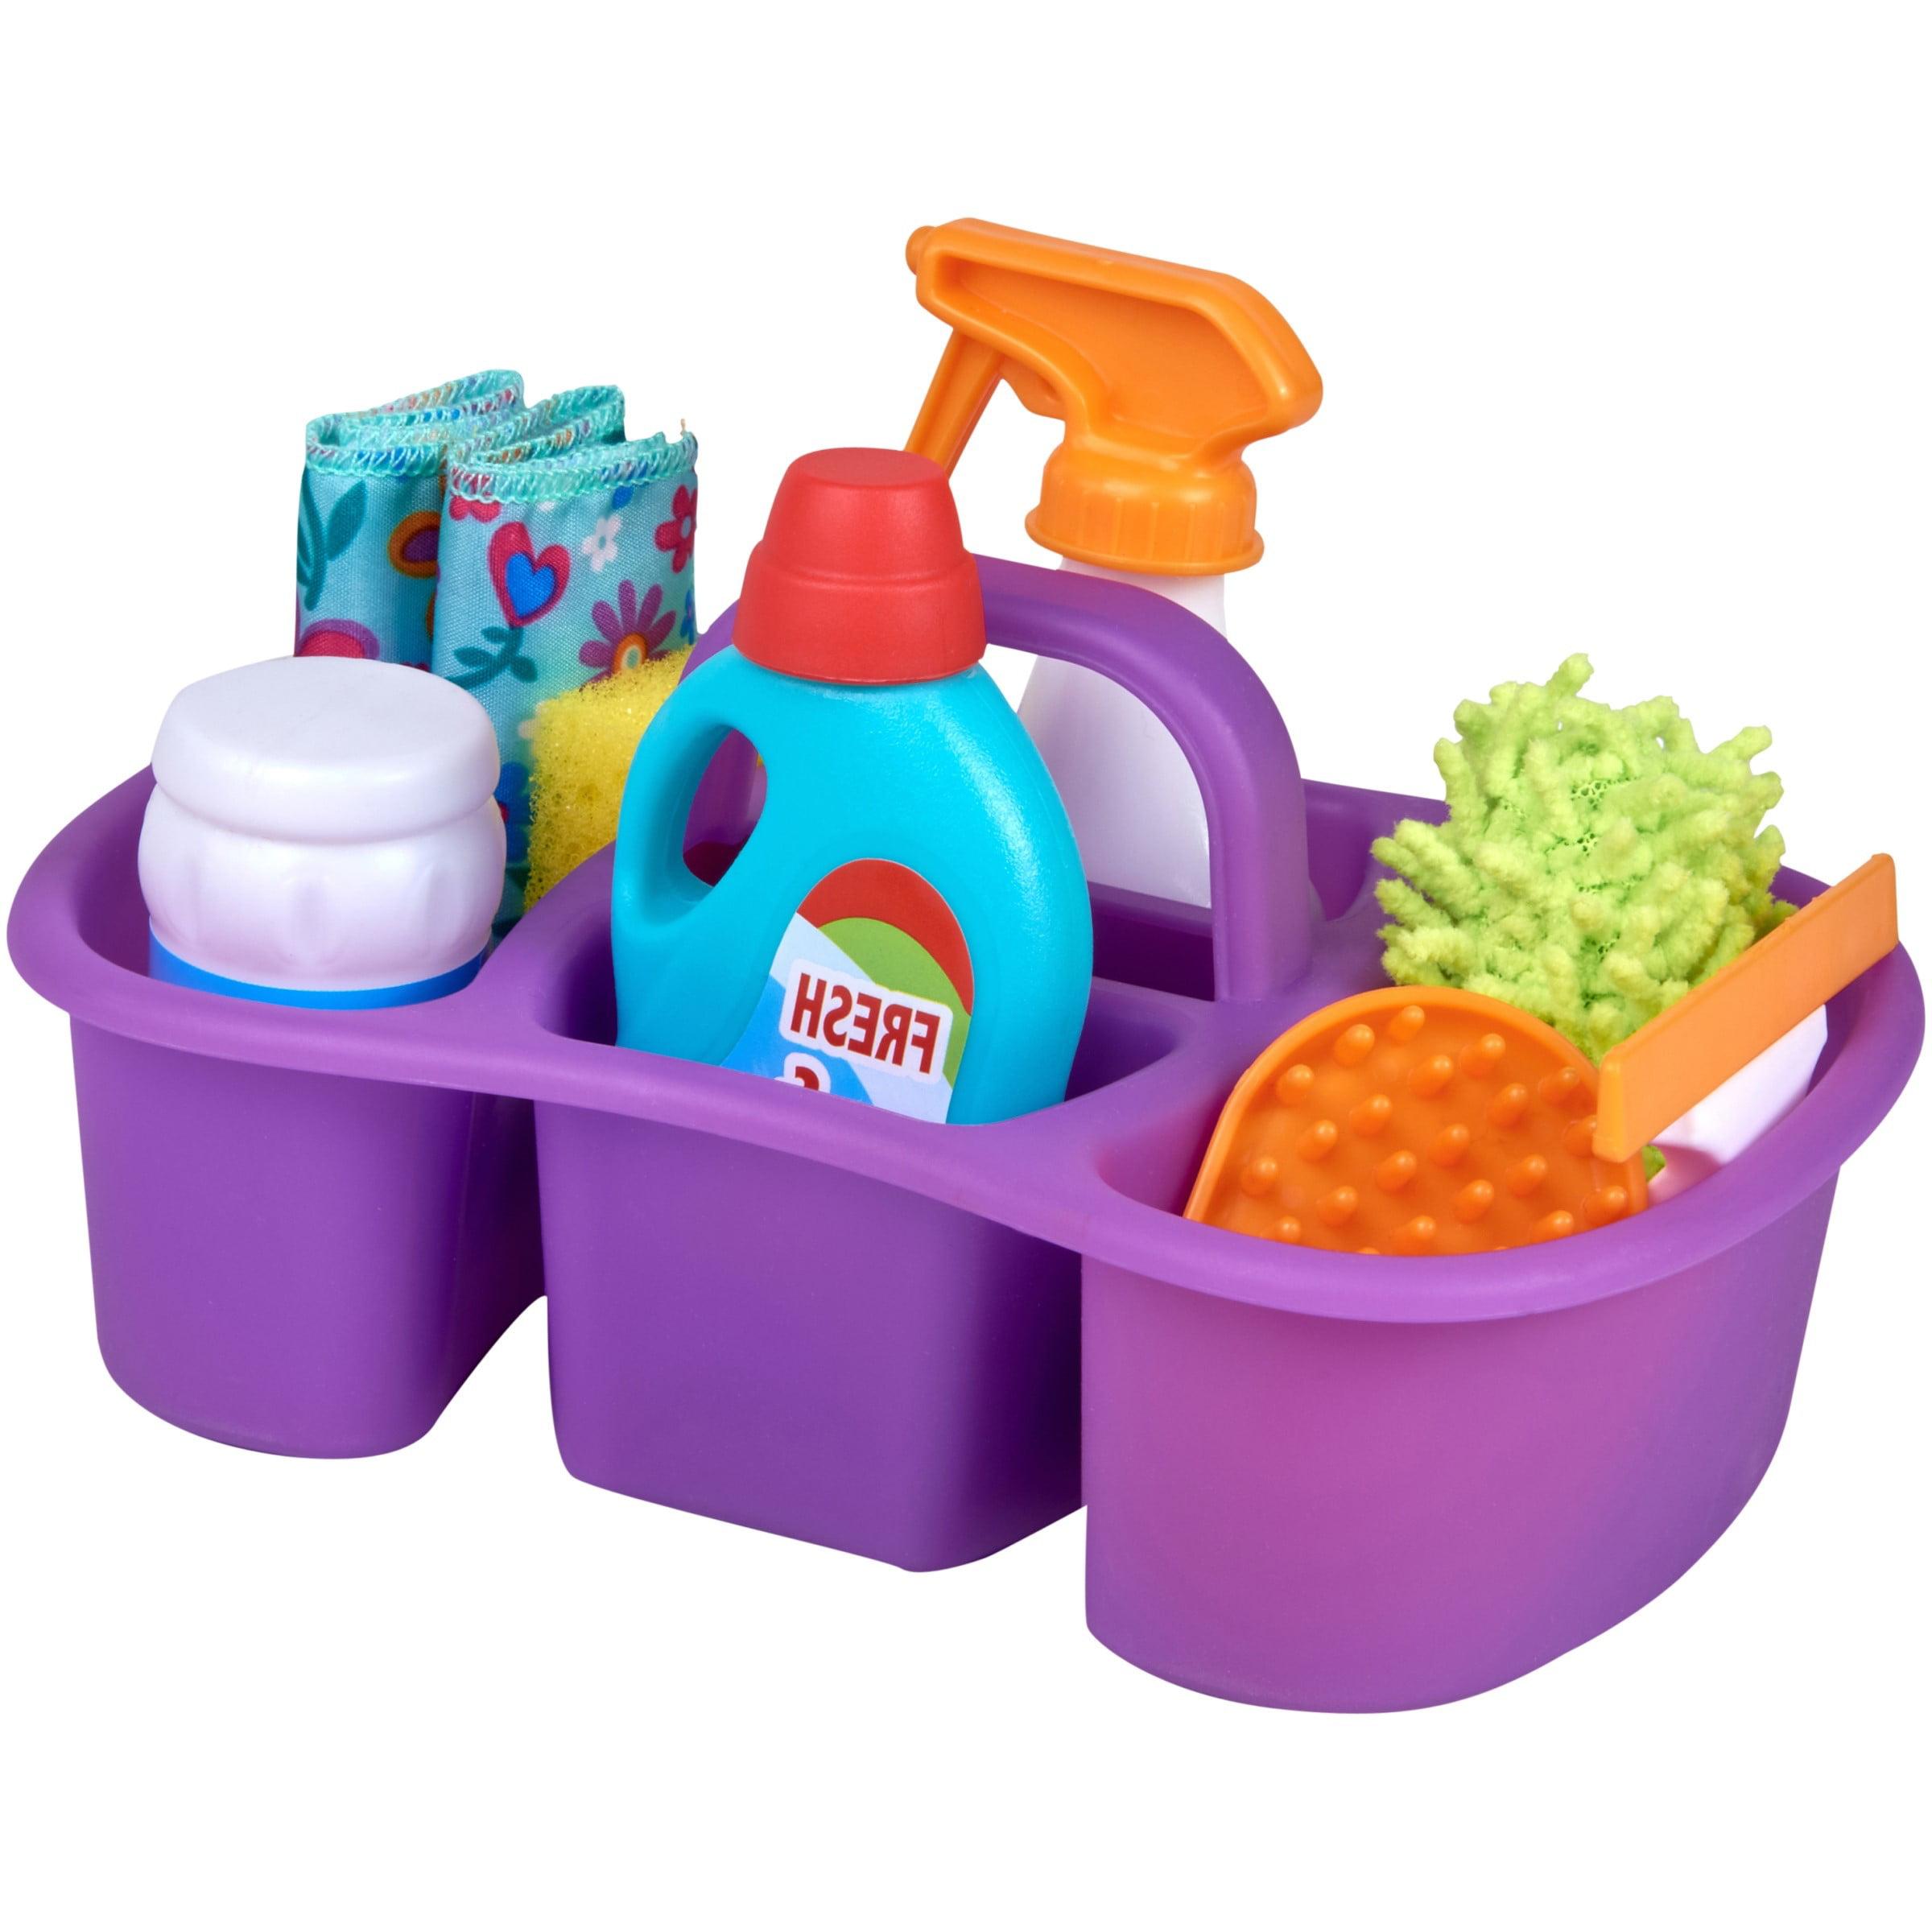 My Life As 10 Piece Cleaning Play Set Caddy Purple For 18 Dolls Walmart Inventory Checker Brickseek